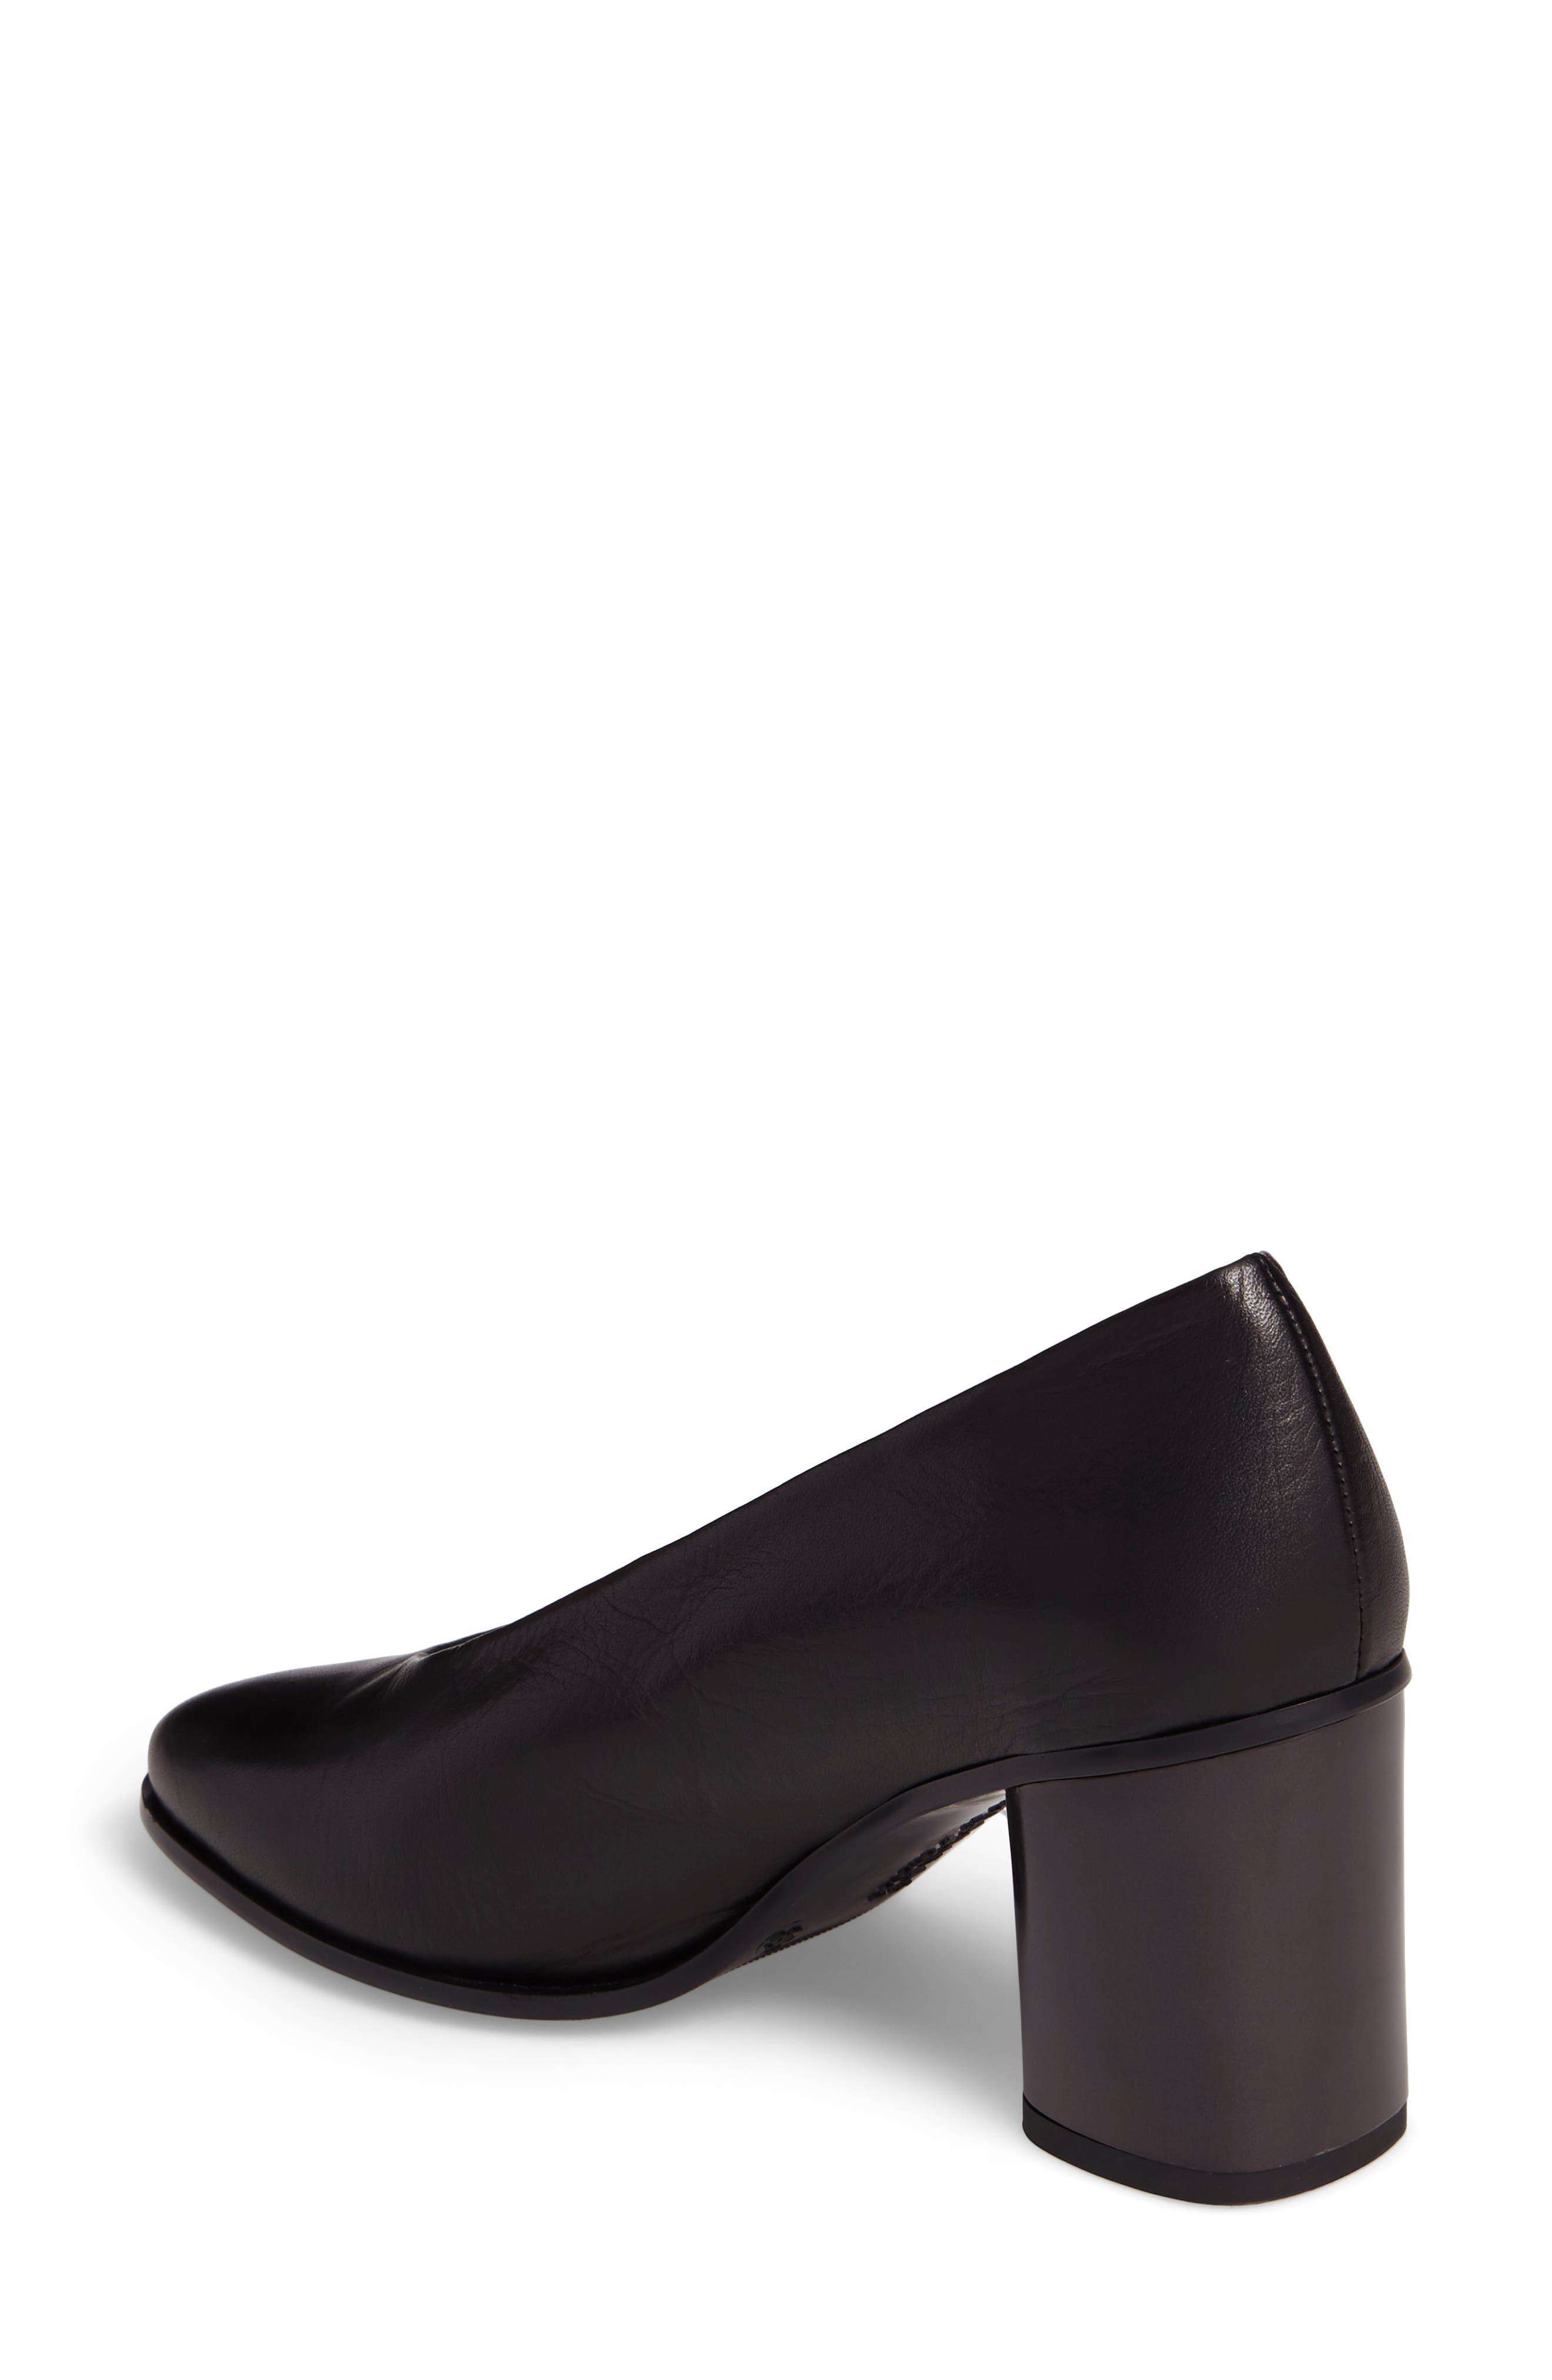 Maddie Block Heel Pump,                             Alternate thumbnail 2, color,                             Soho Black Leather